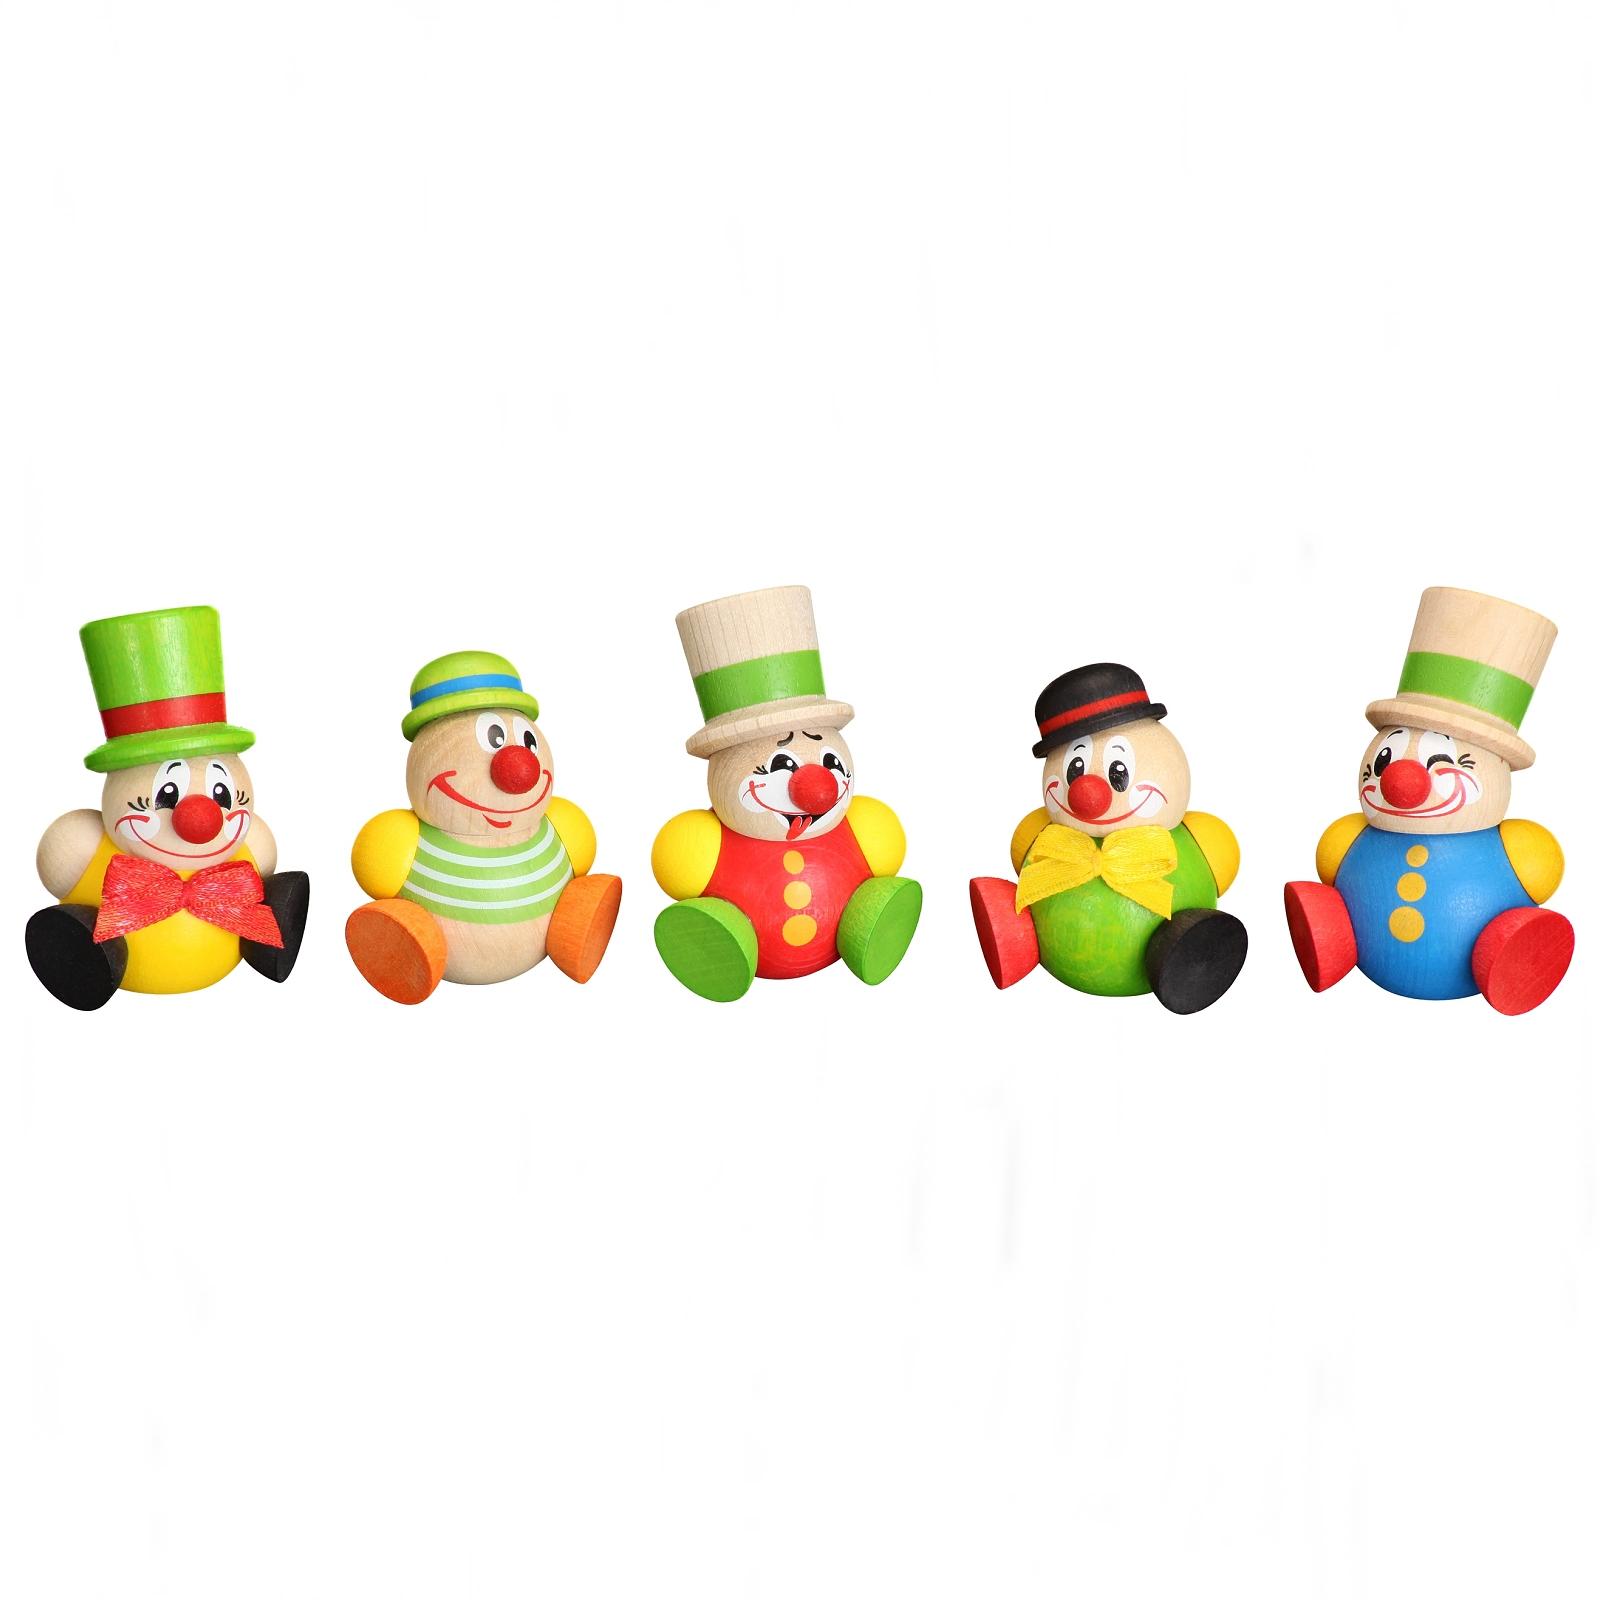 Kugelfigur Cool-Man Clowny, 5-teilig